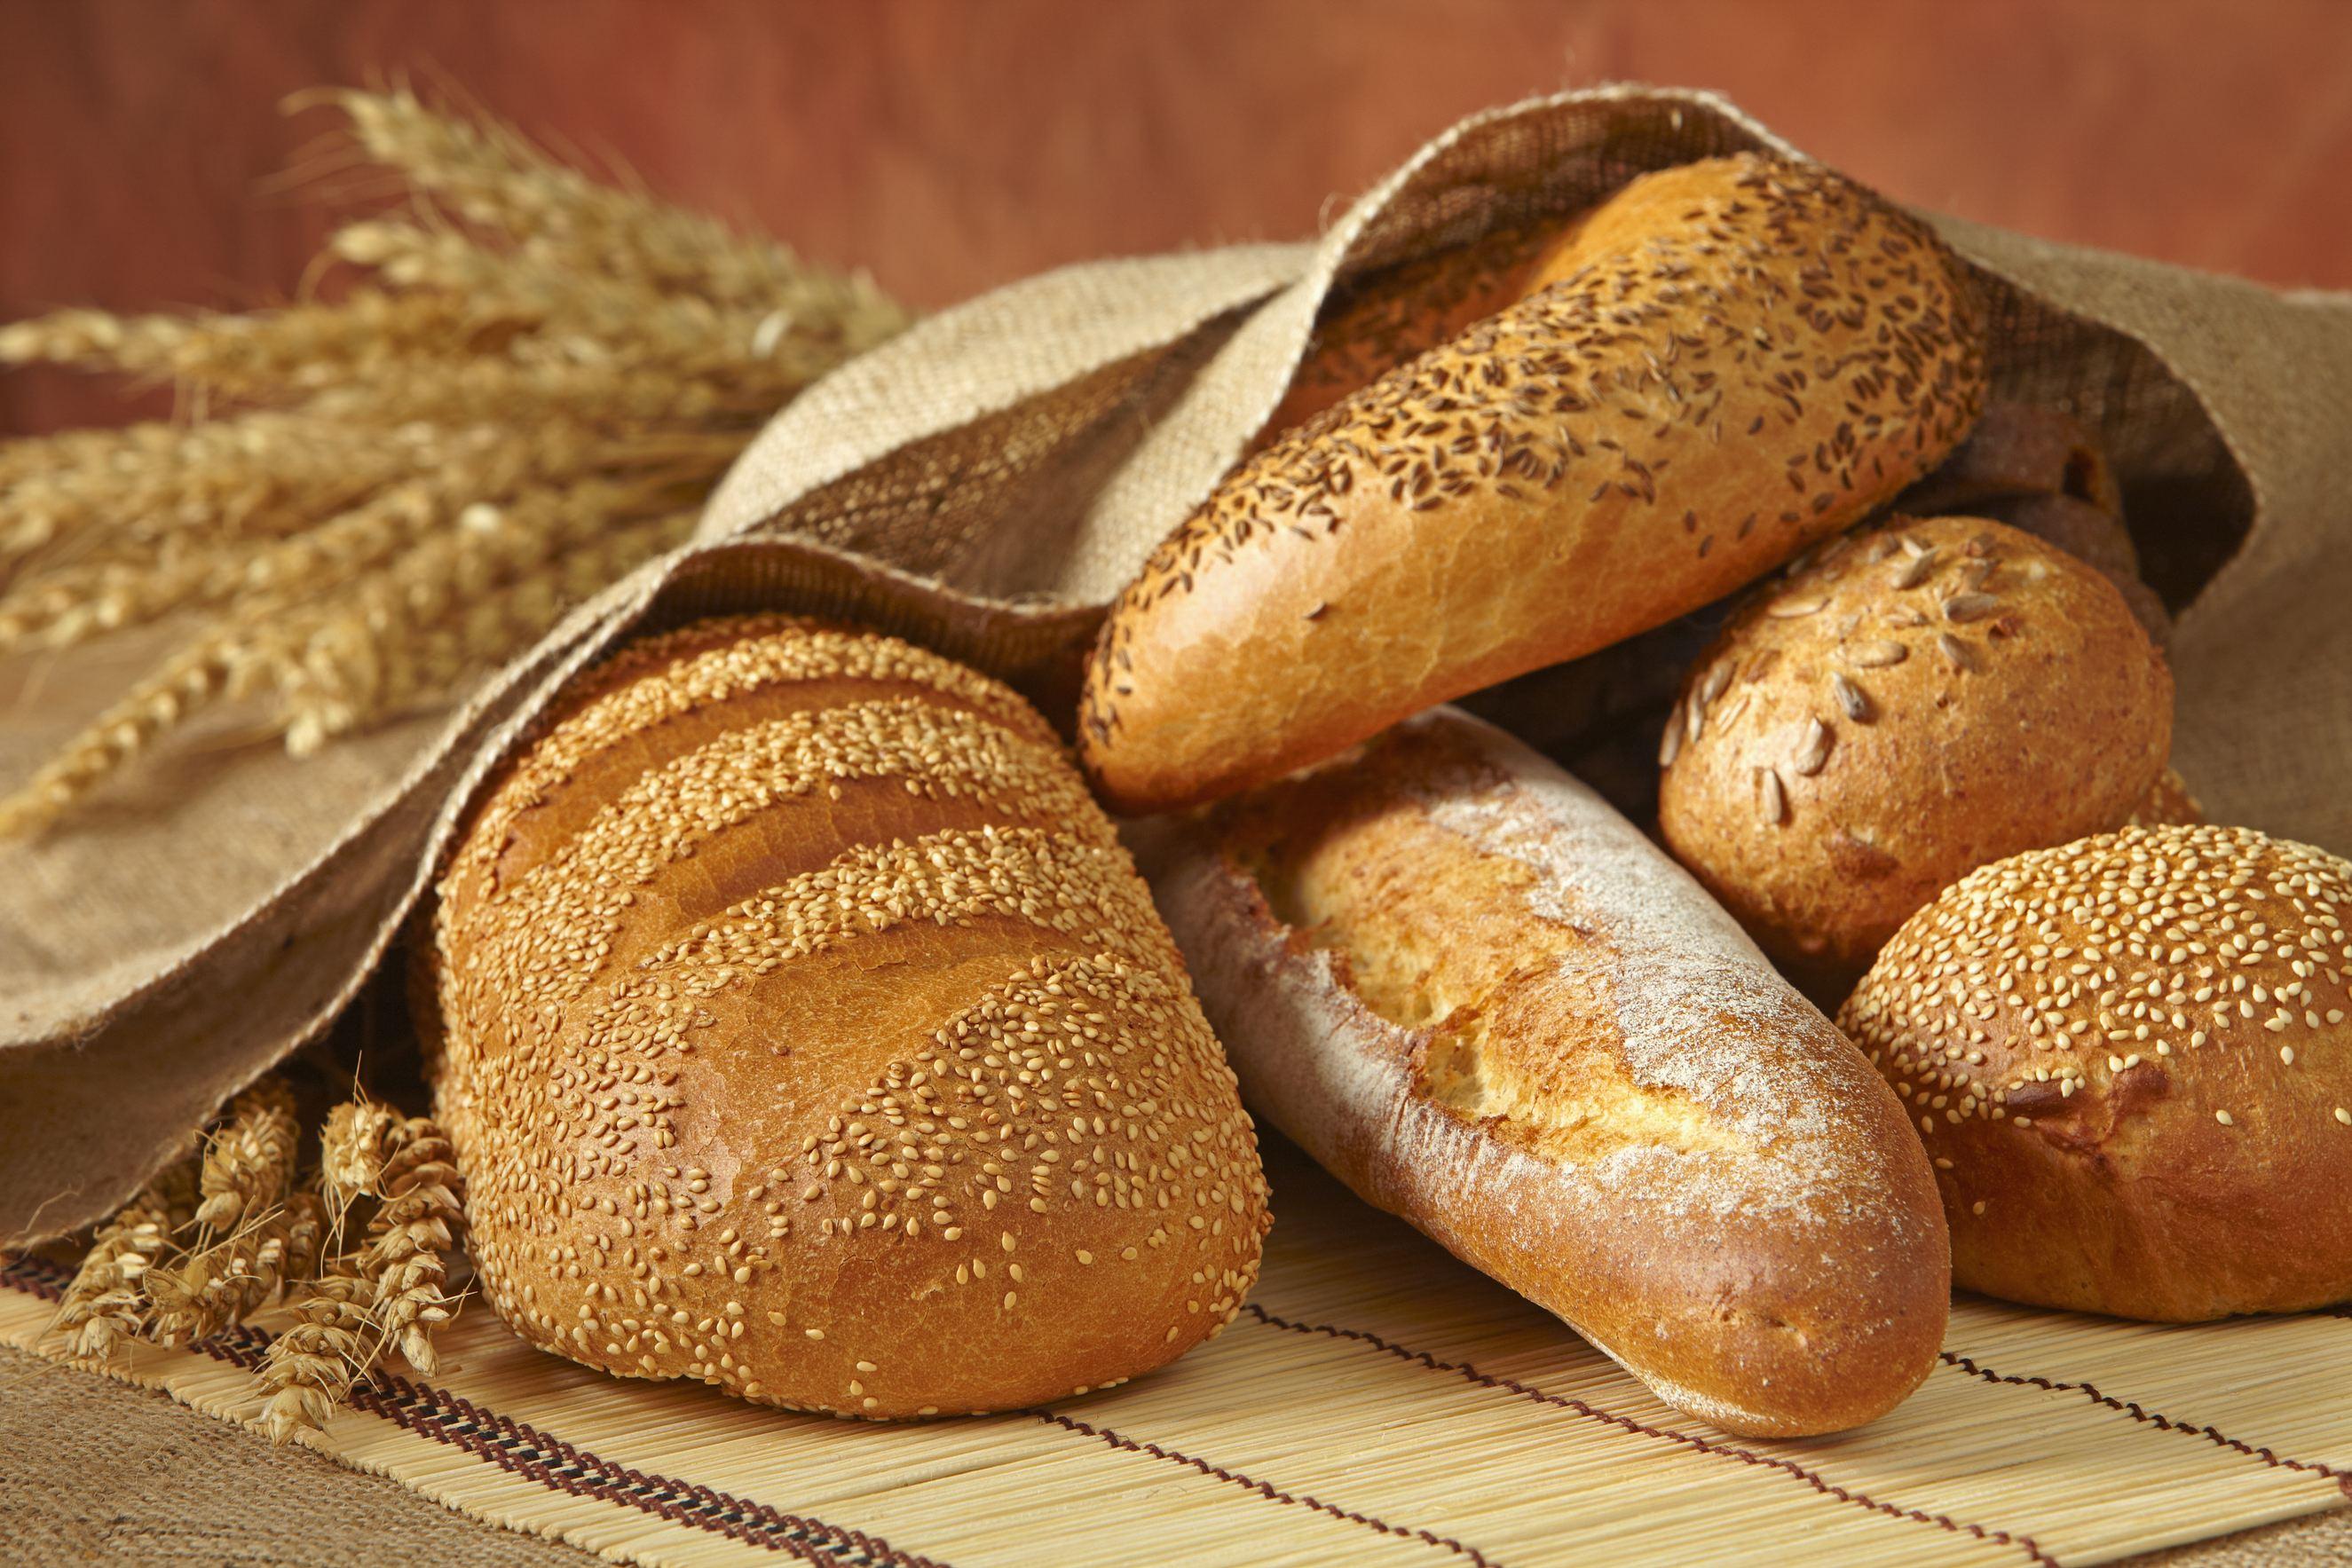 Free photo: Fresh Baked Bread - Bake, Baked, Bakery - Free ...